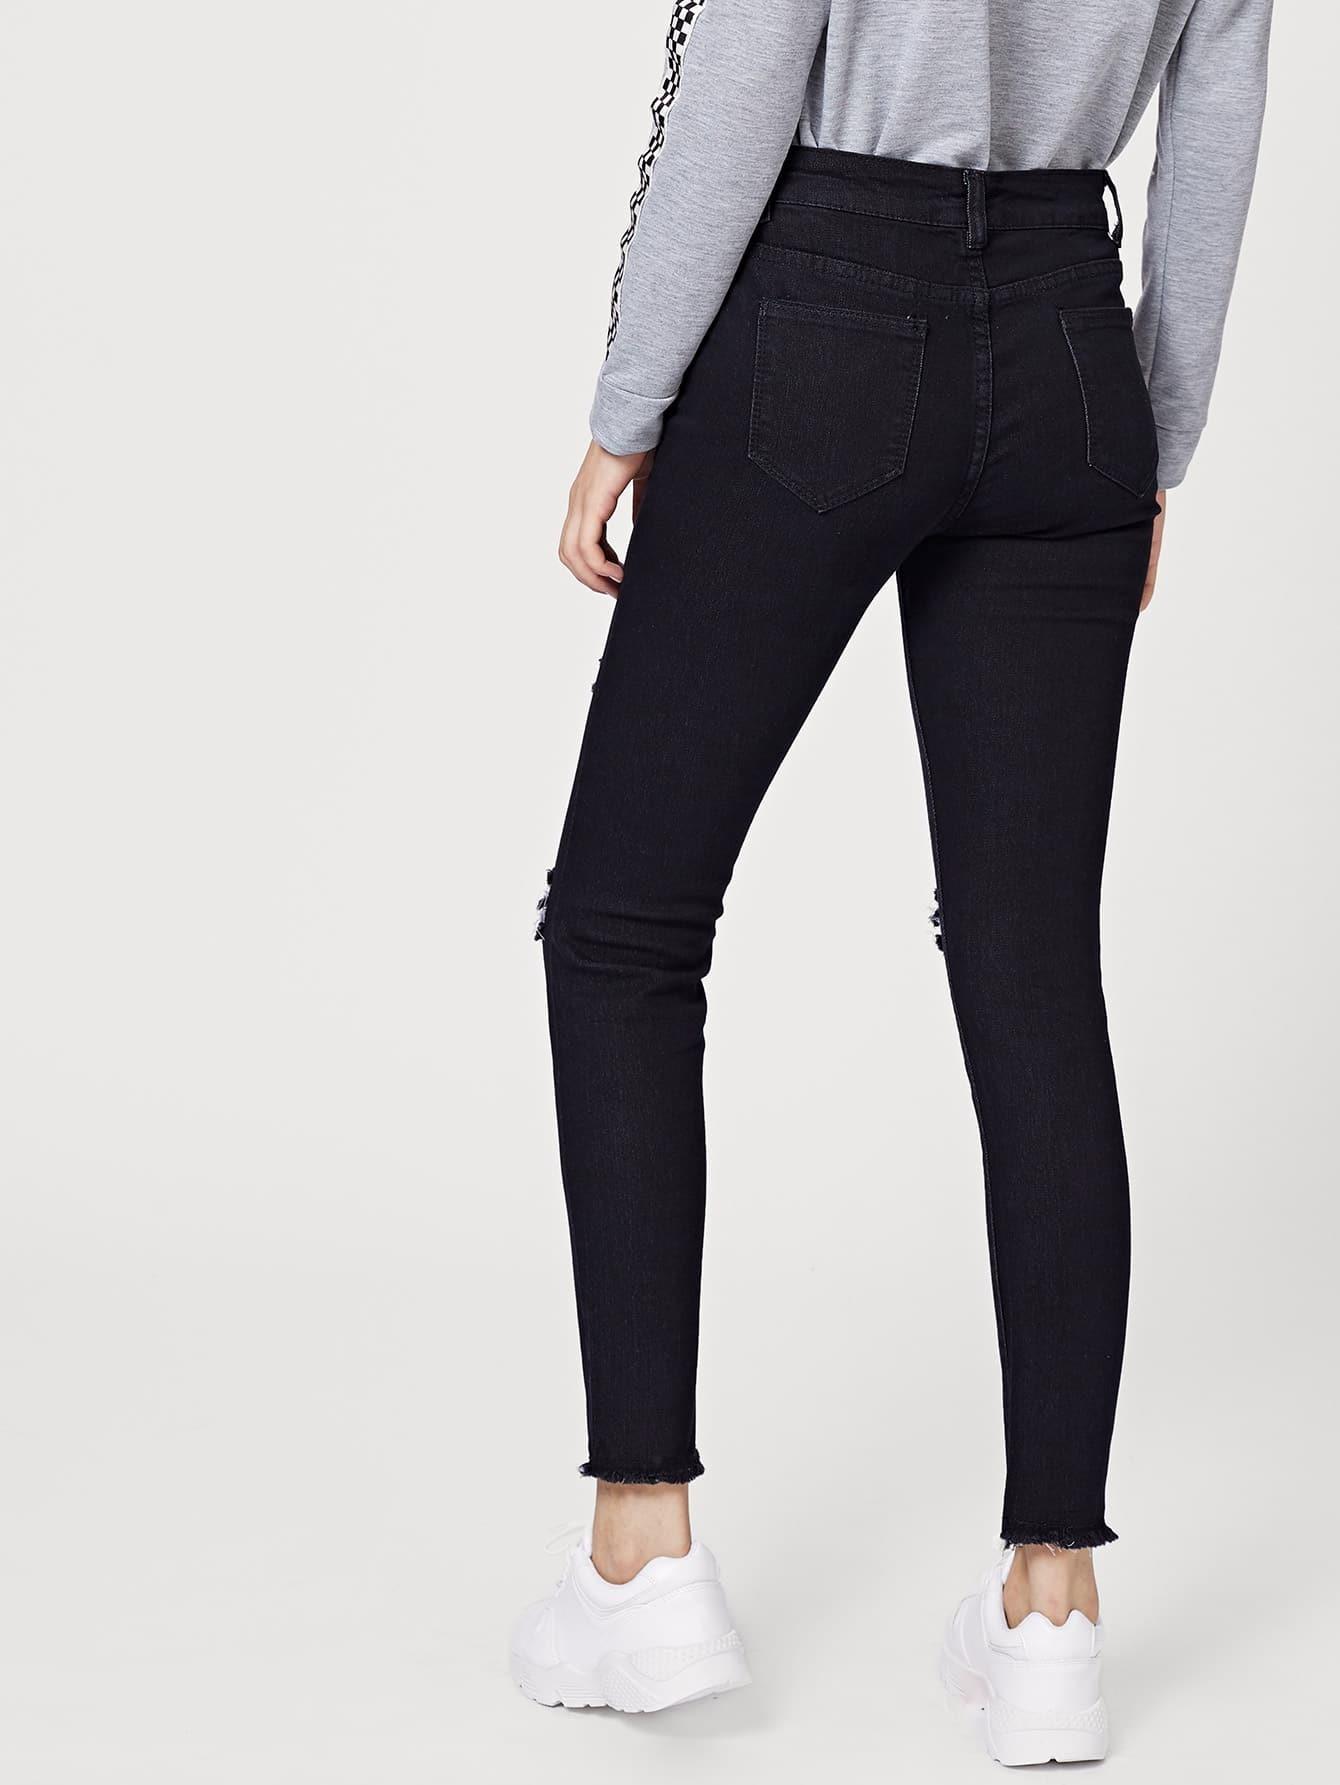 reine zerrissene jeans german shein sheinside. Black Bedroom Furniture Sets. Home Design Ideas